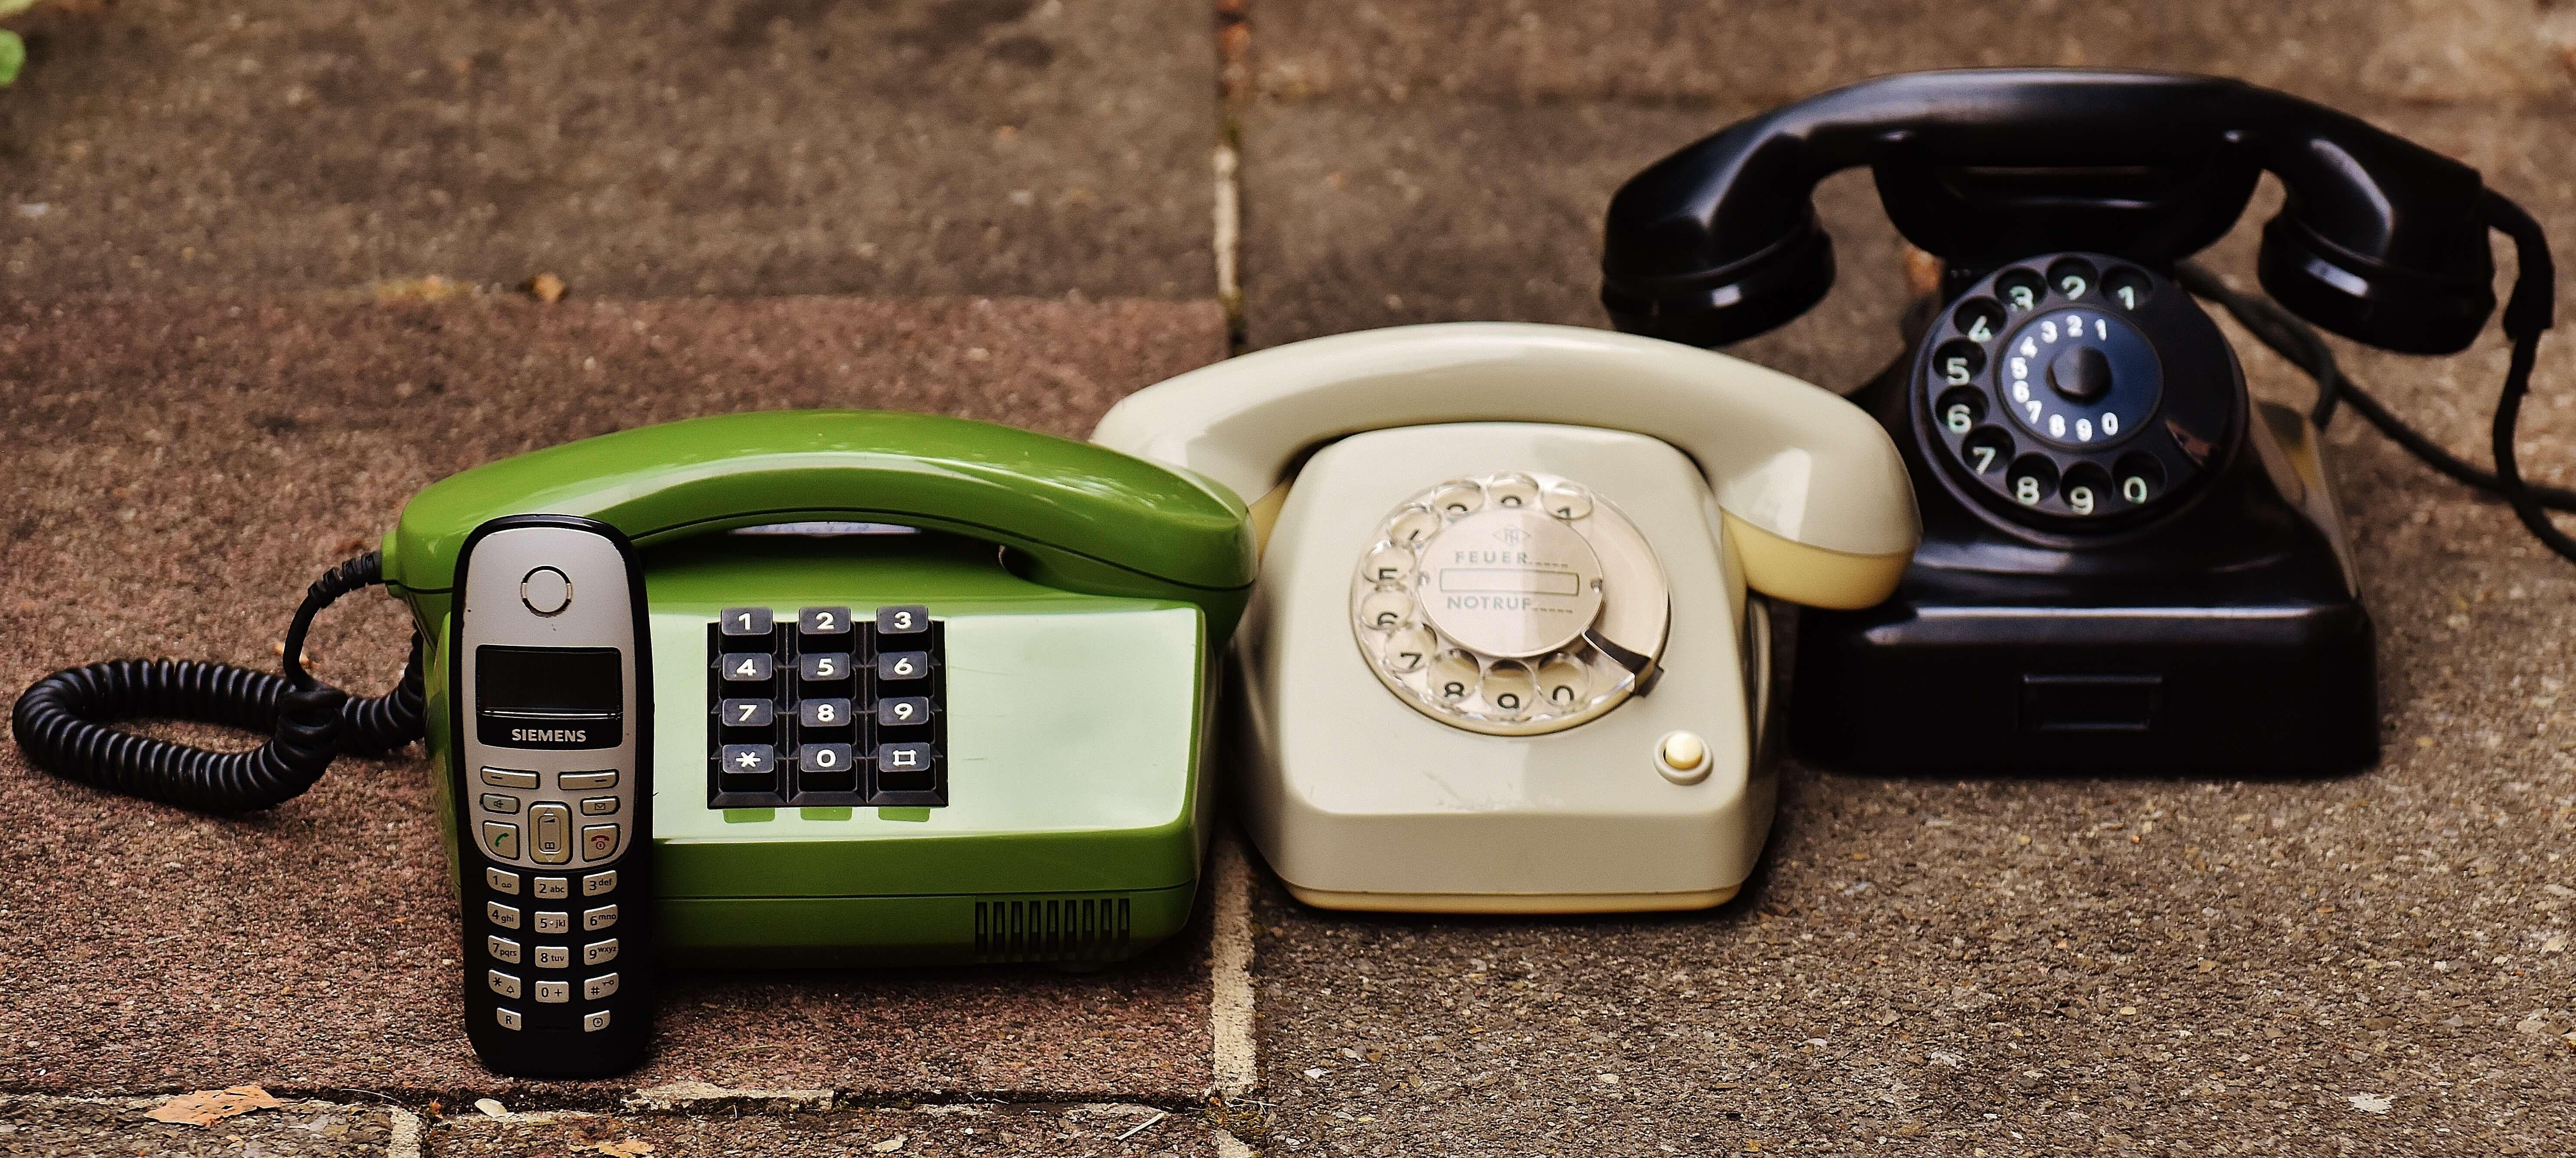 antique-business-call-207456